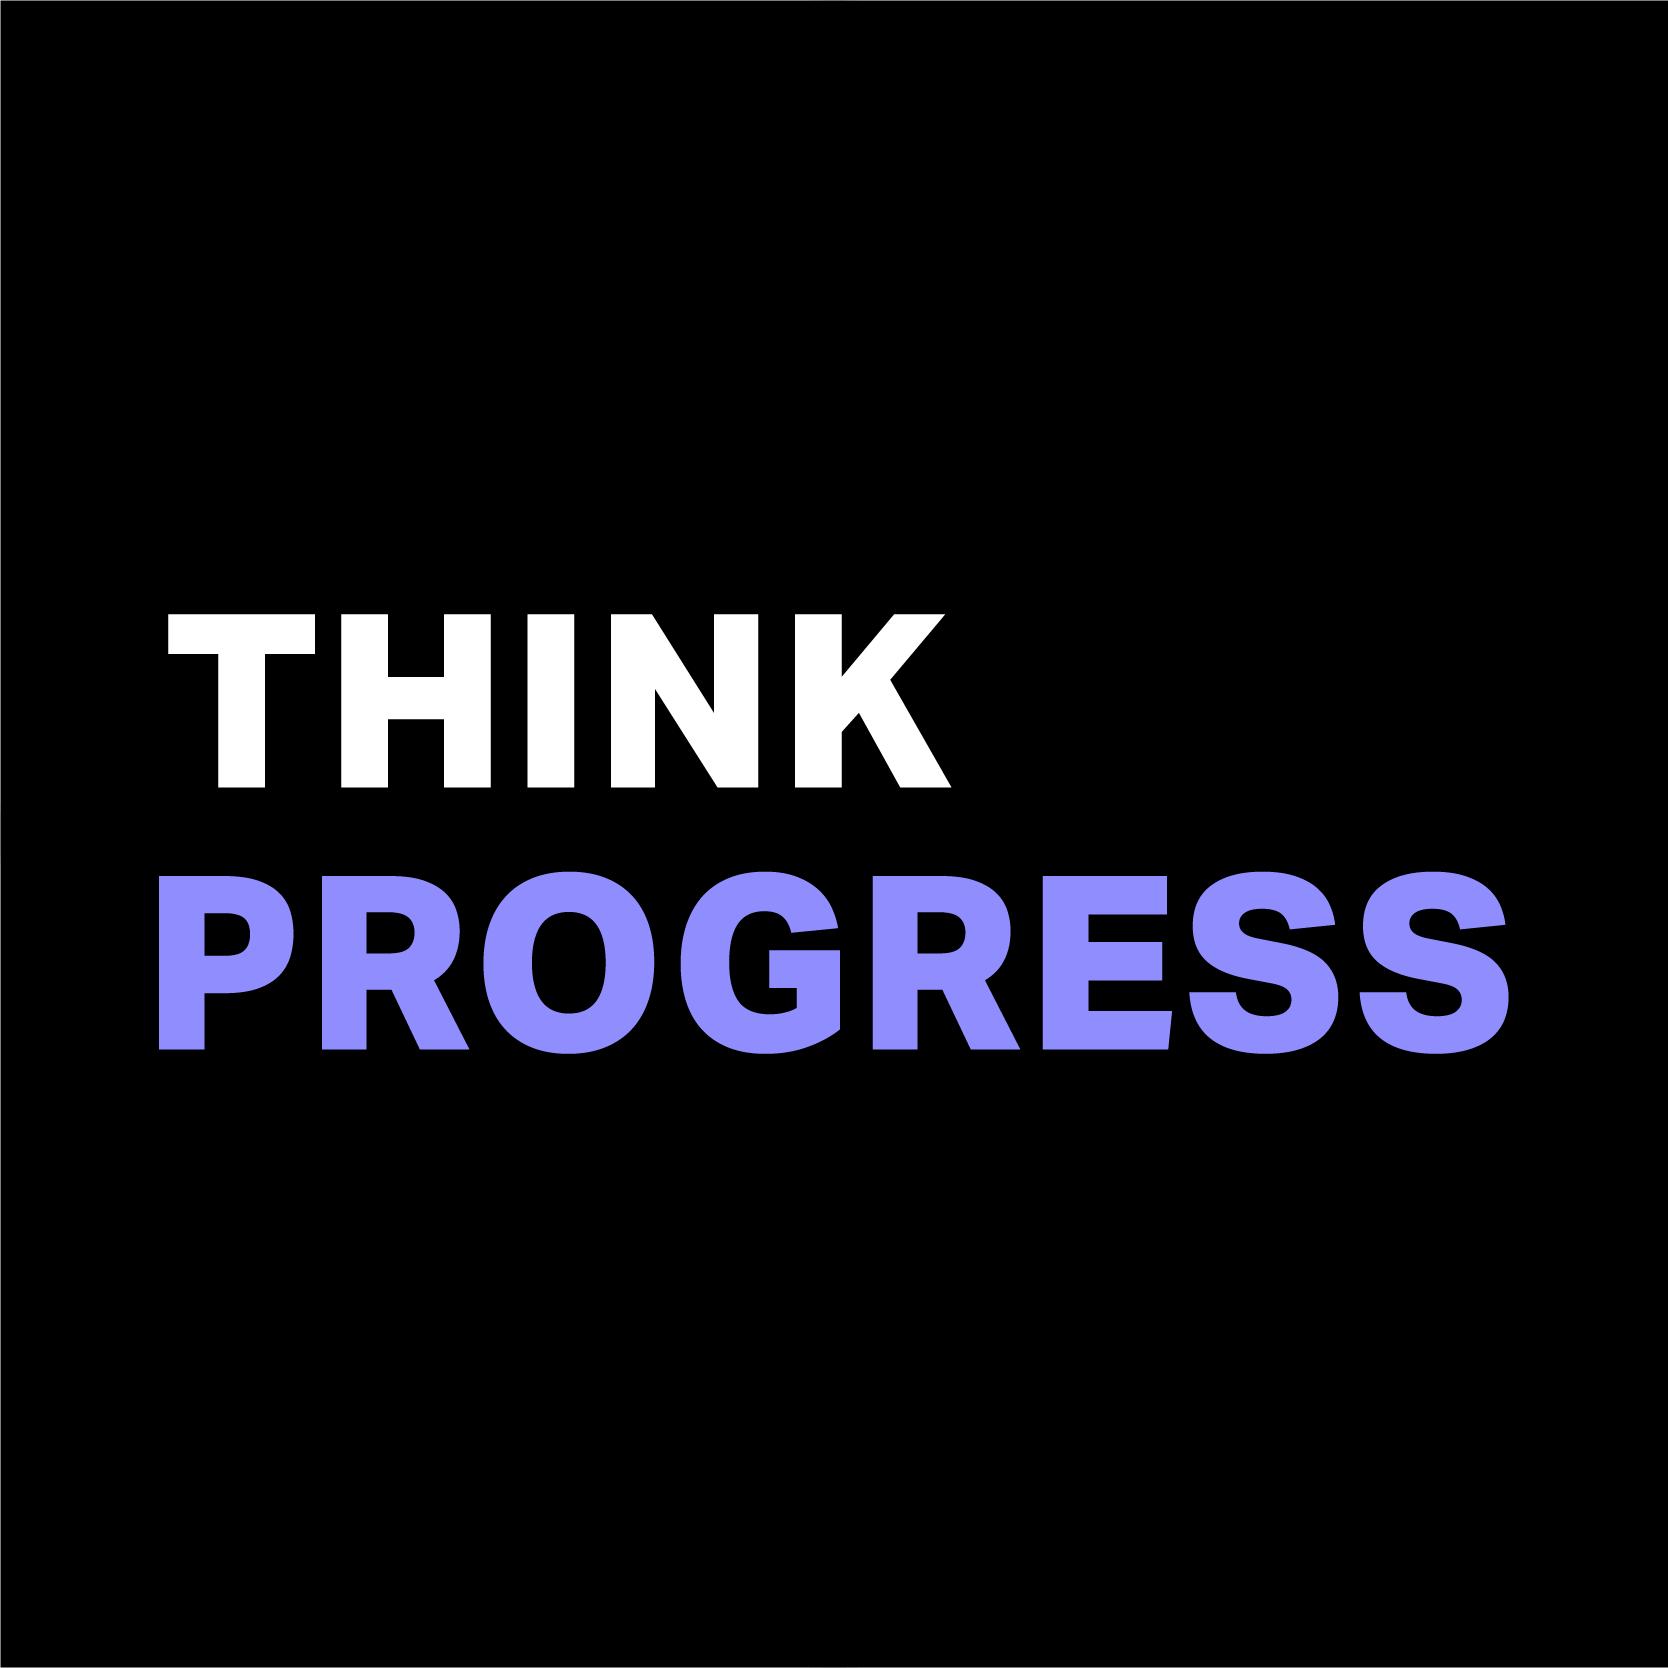 Think progress logo.png